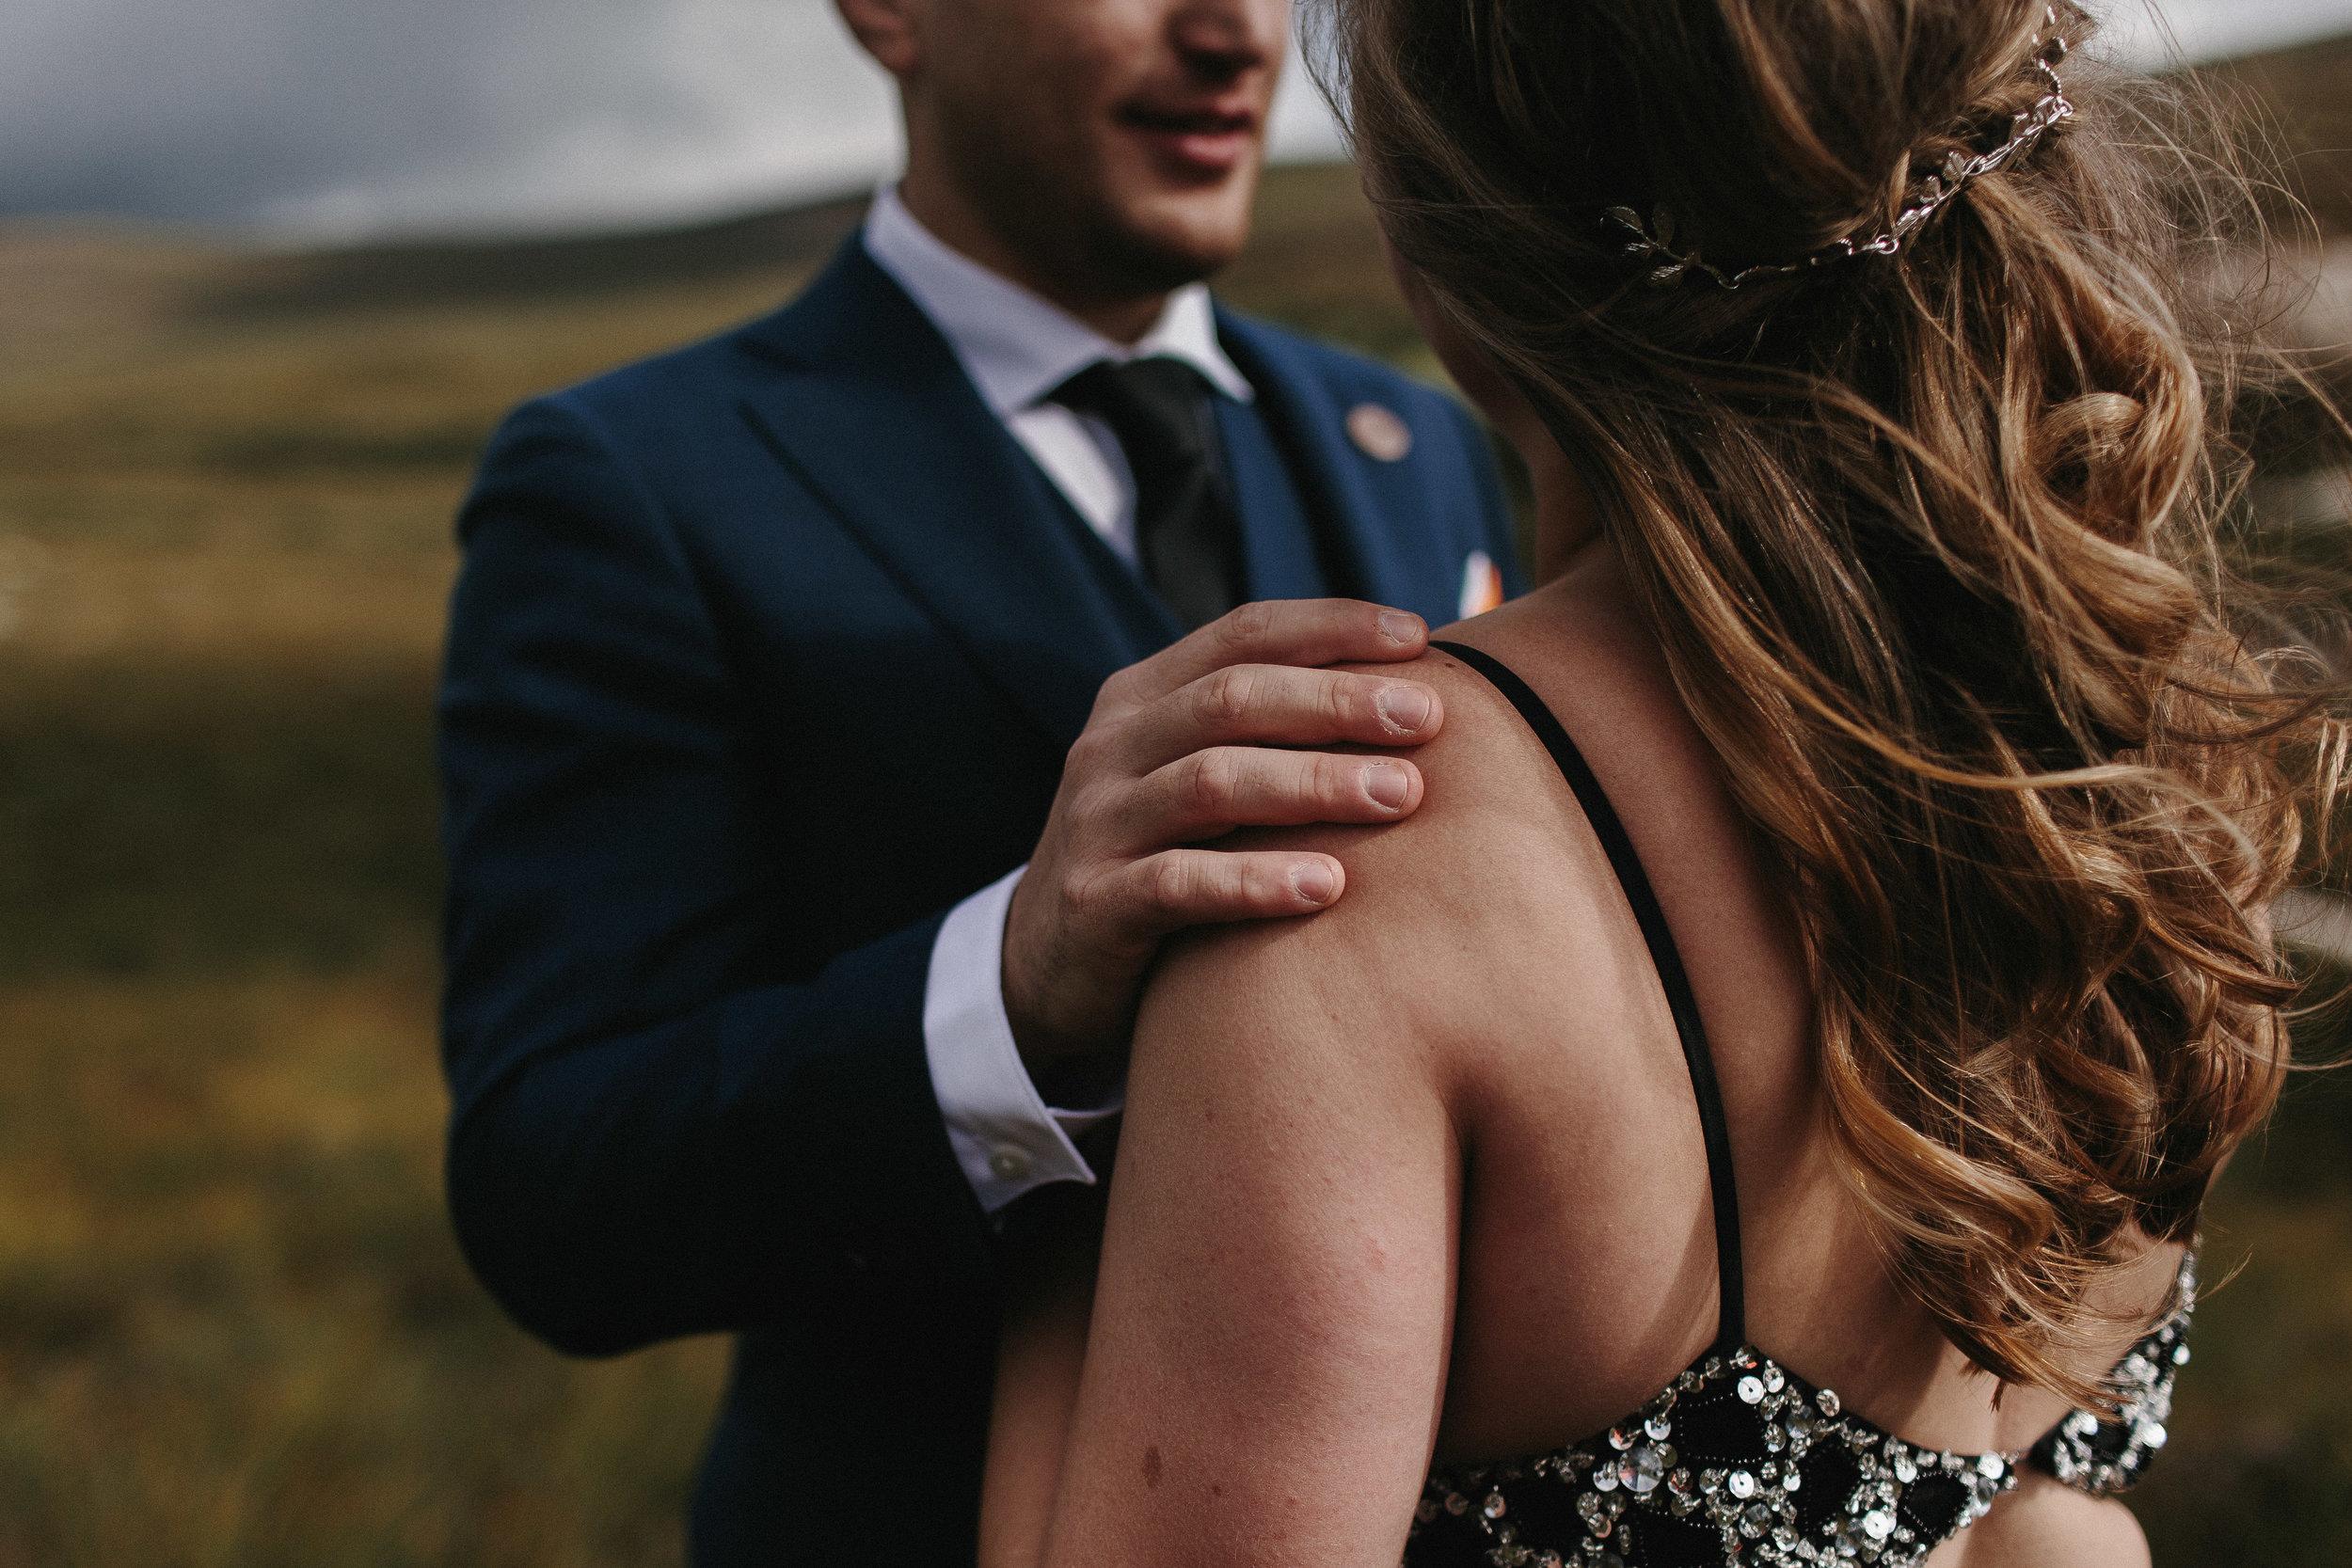 ireland_elopement_black_wedding_dress_wicklow_glendalough_athy_st_kevins_way_1274.jpg